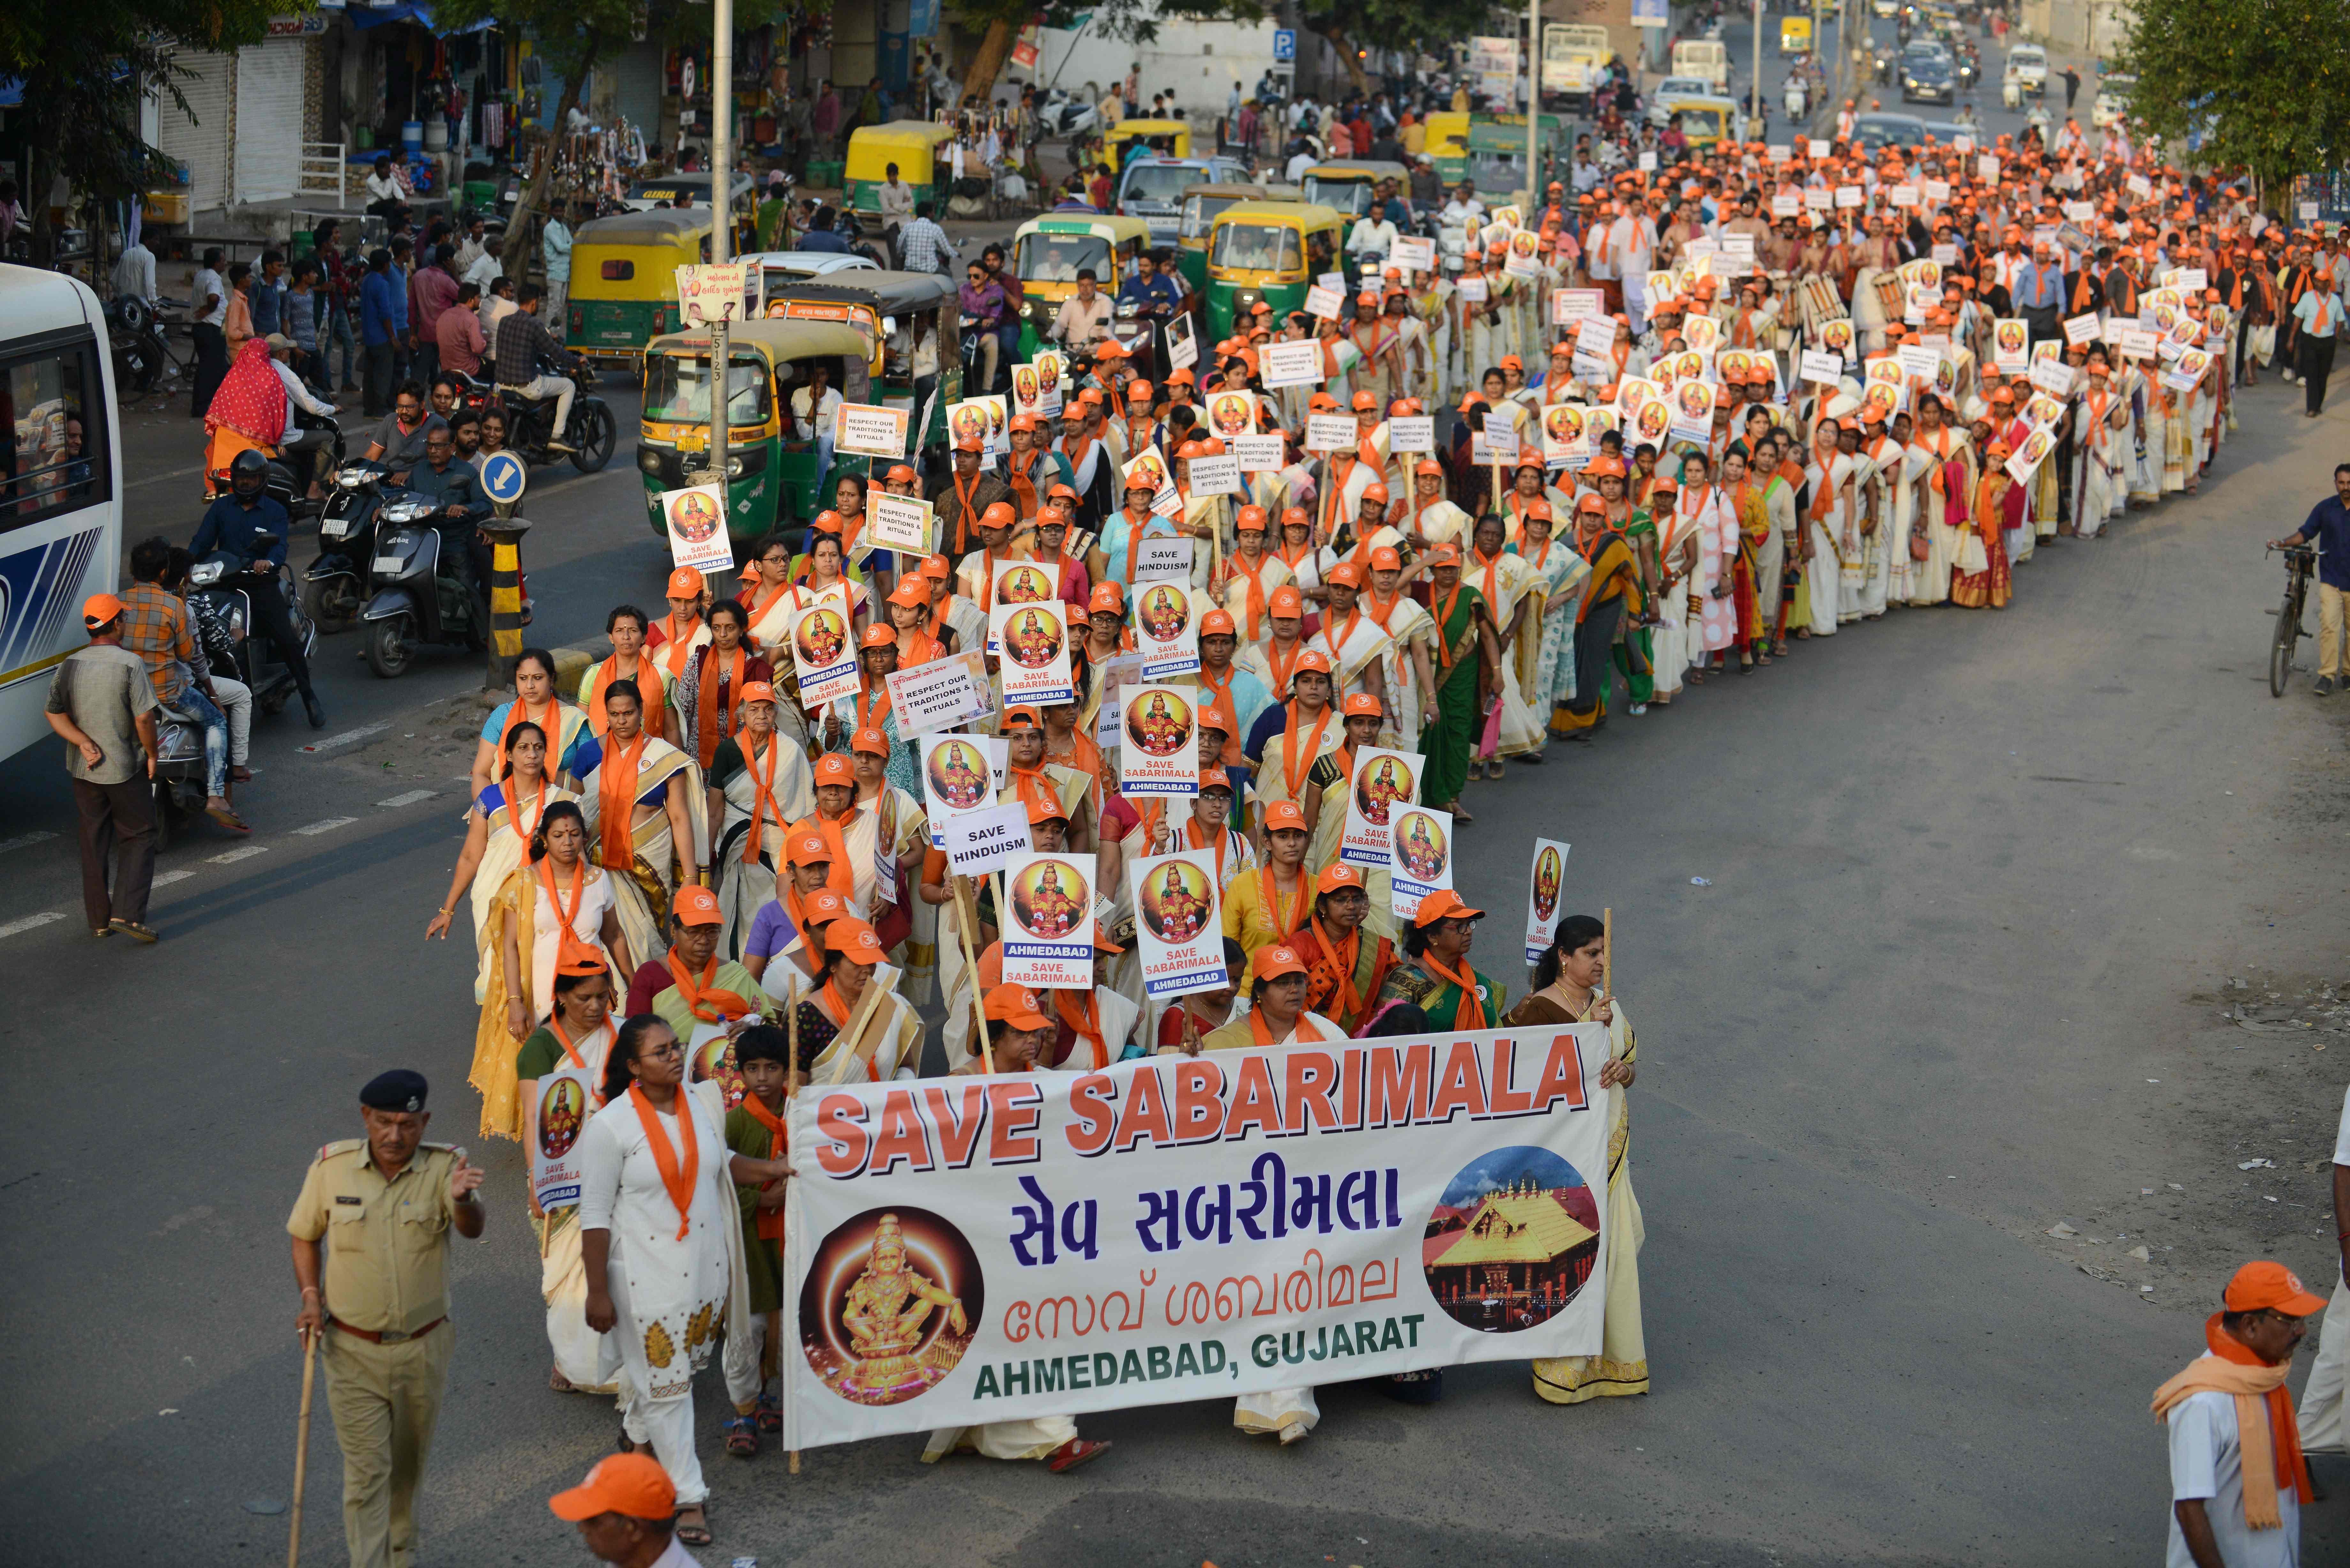 INDIA-COURT-HINDU-TEMPLE